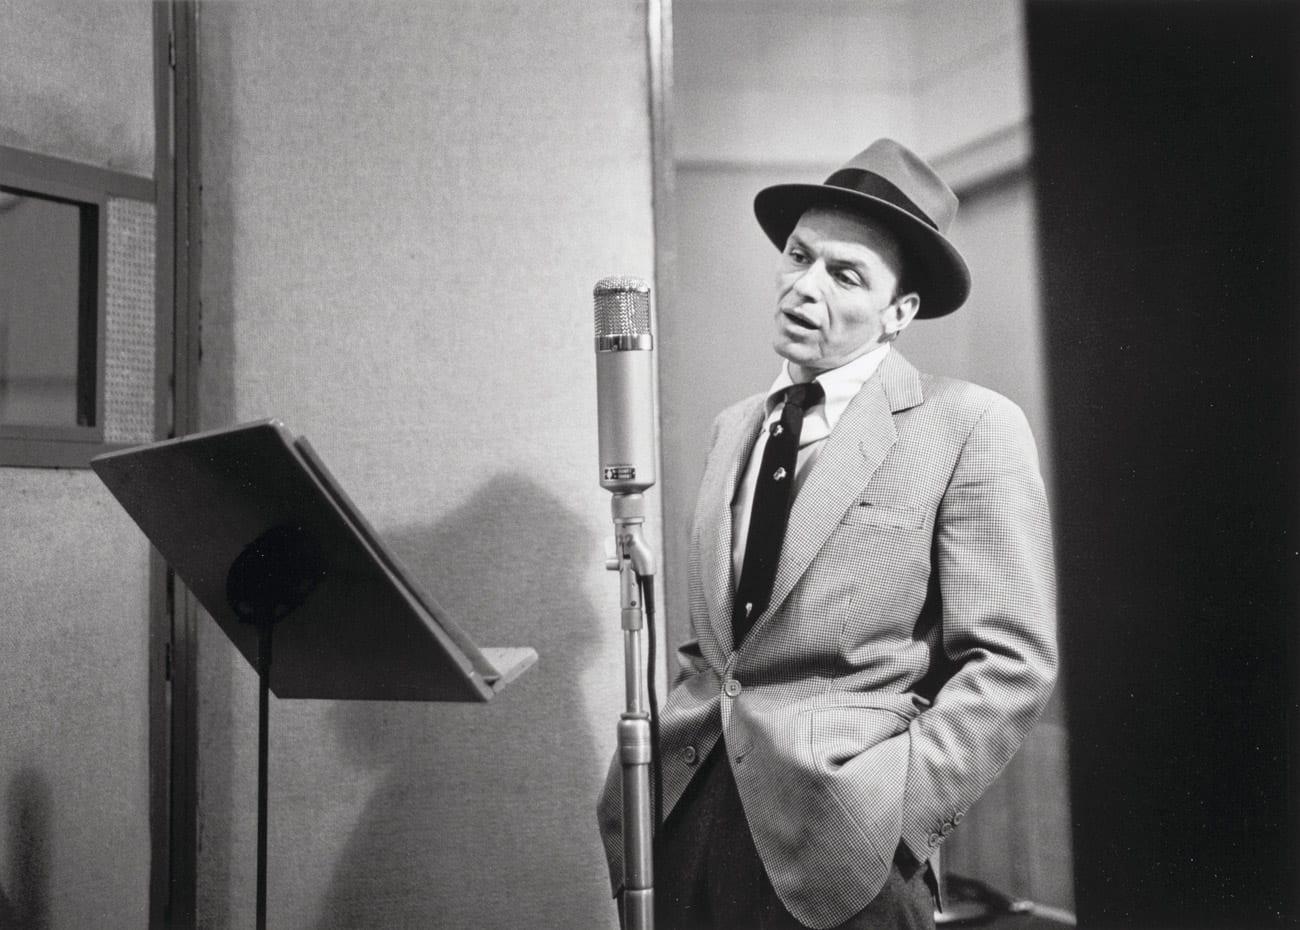 Herman Leonard, Frank Sinatra, New York City